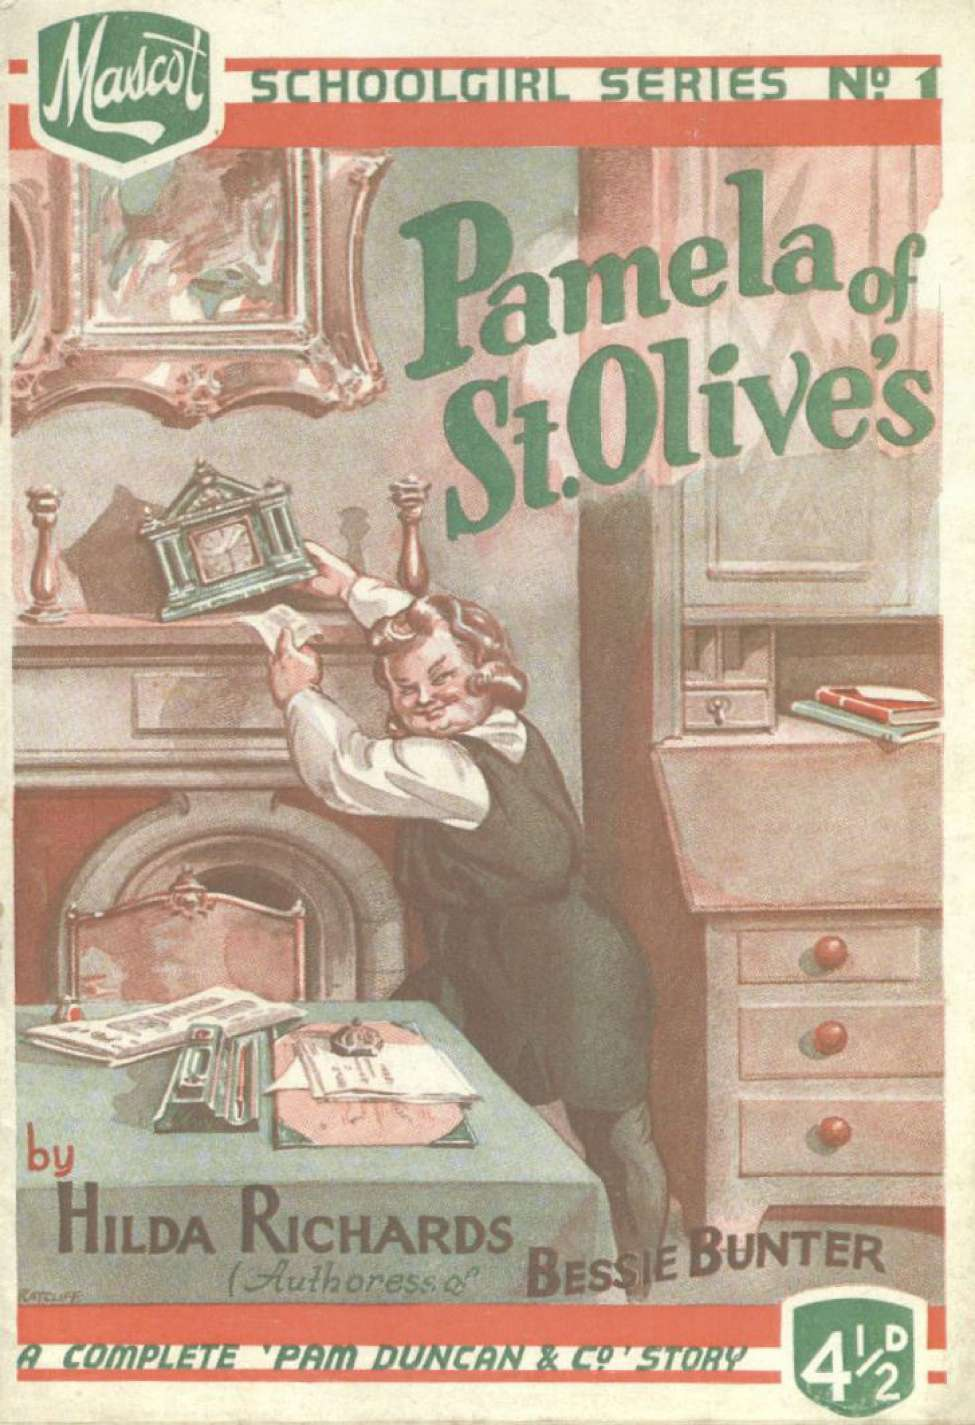 Comic Book Cover For Mascot Schoolgirl Series 01 - Pamela of St. Olives